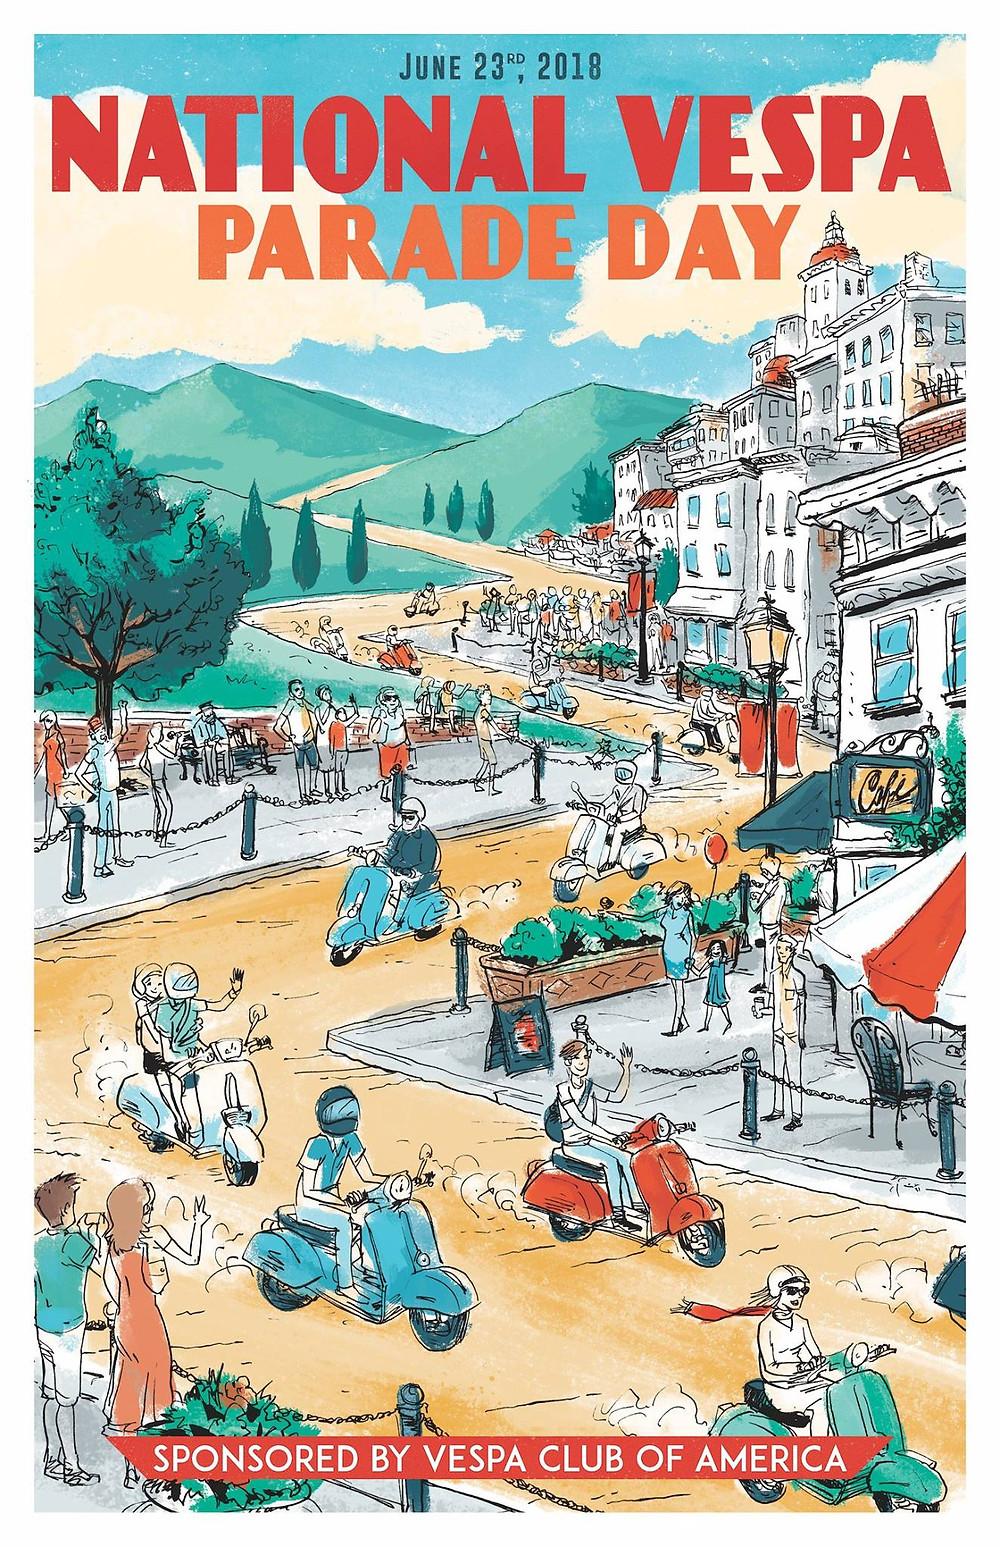 National Vespa Parade Day 2018